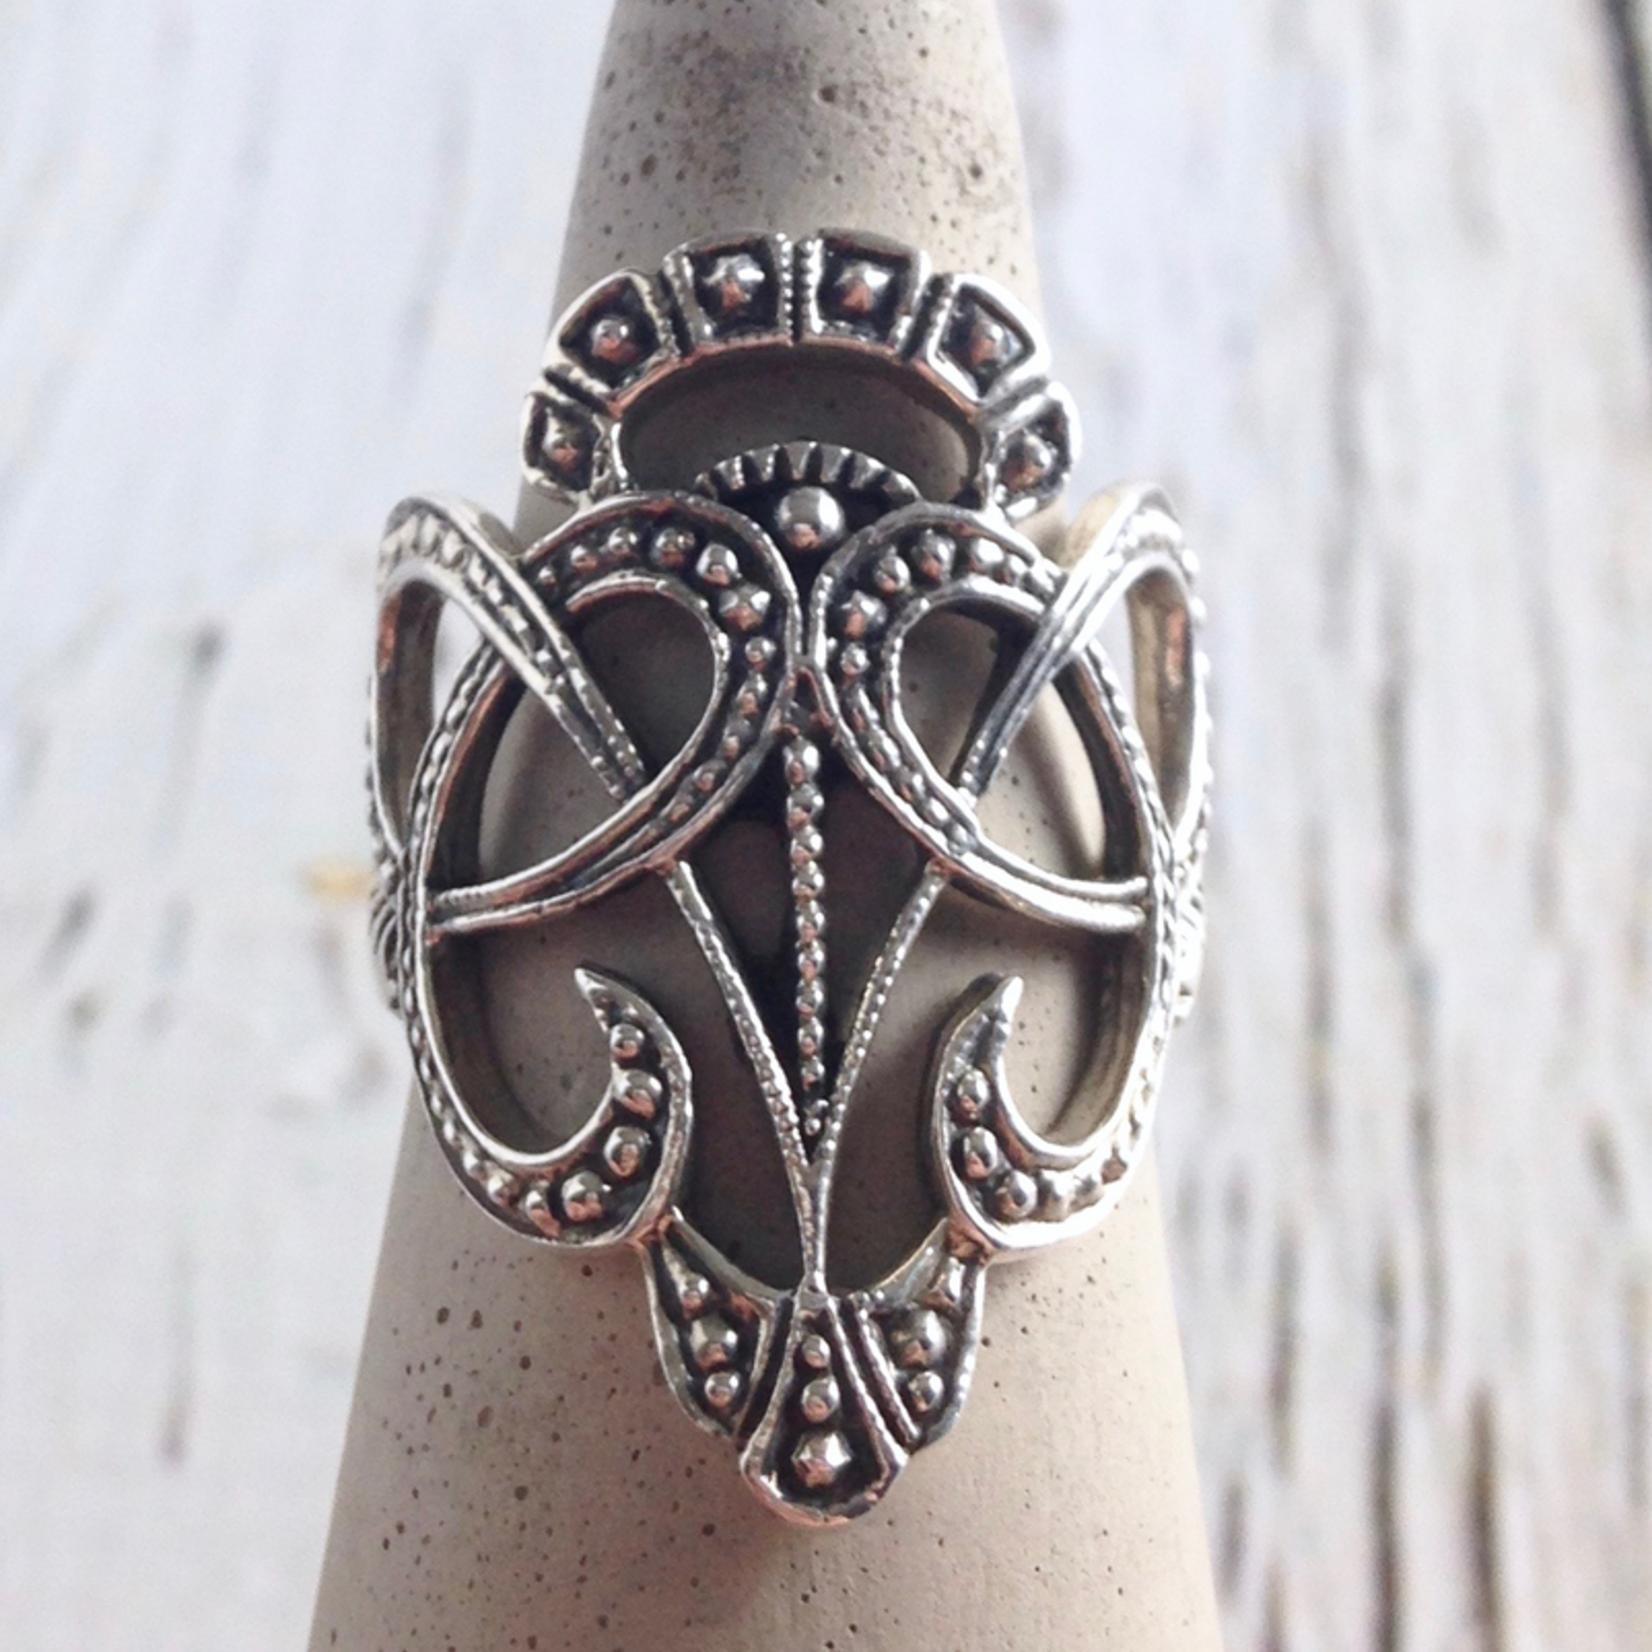 Majestic Ring